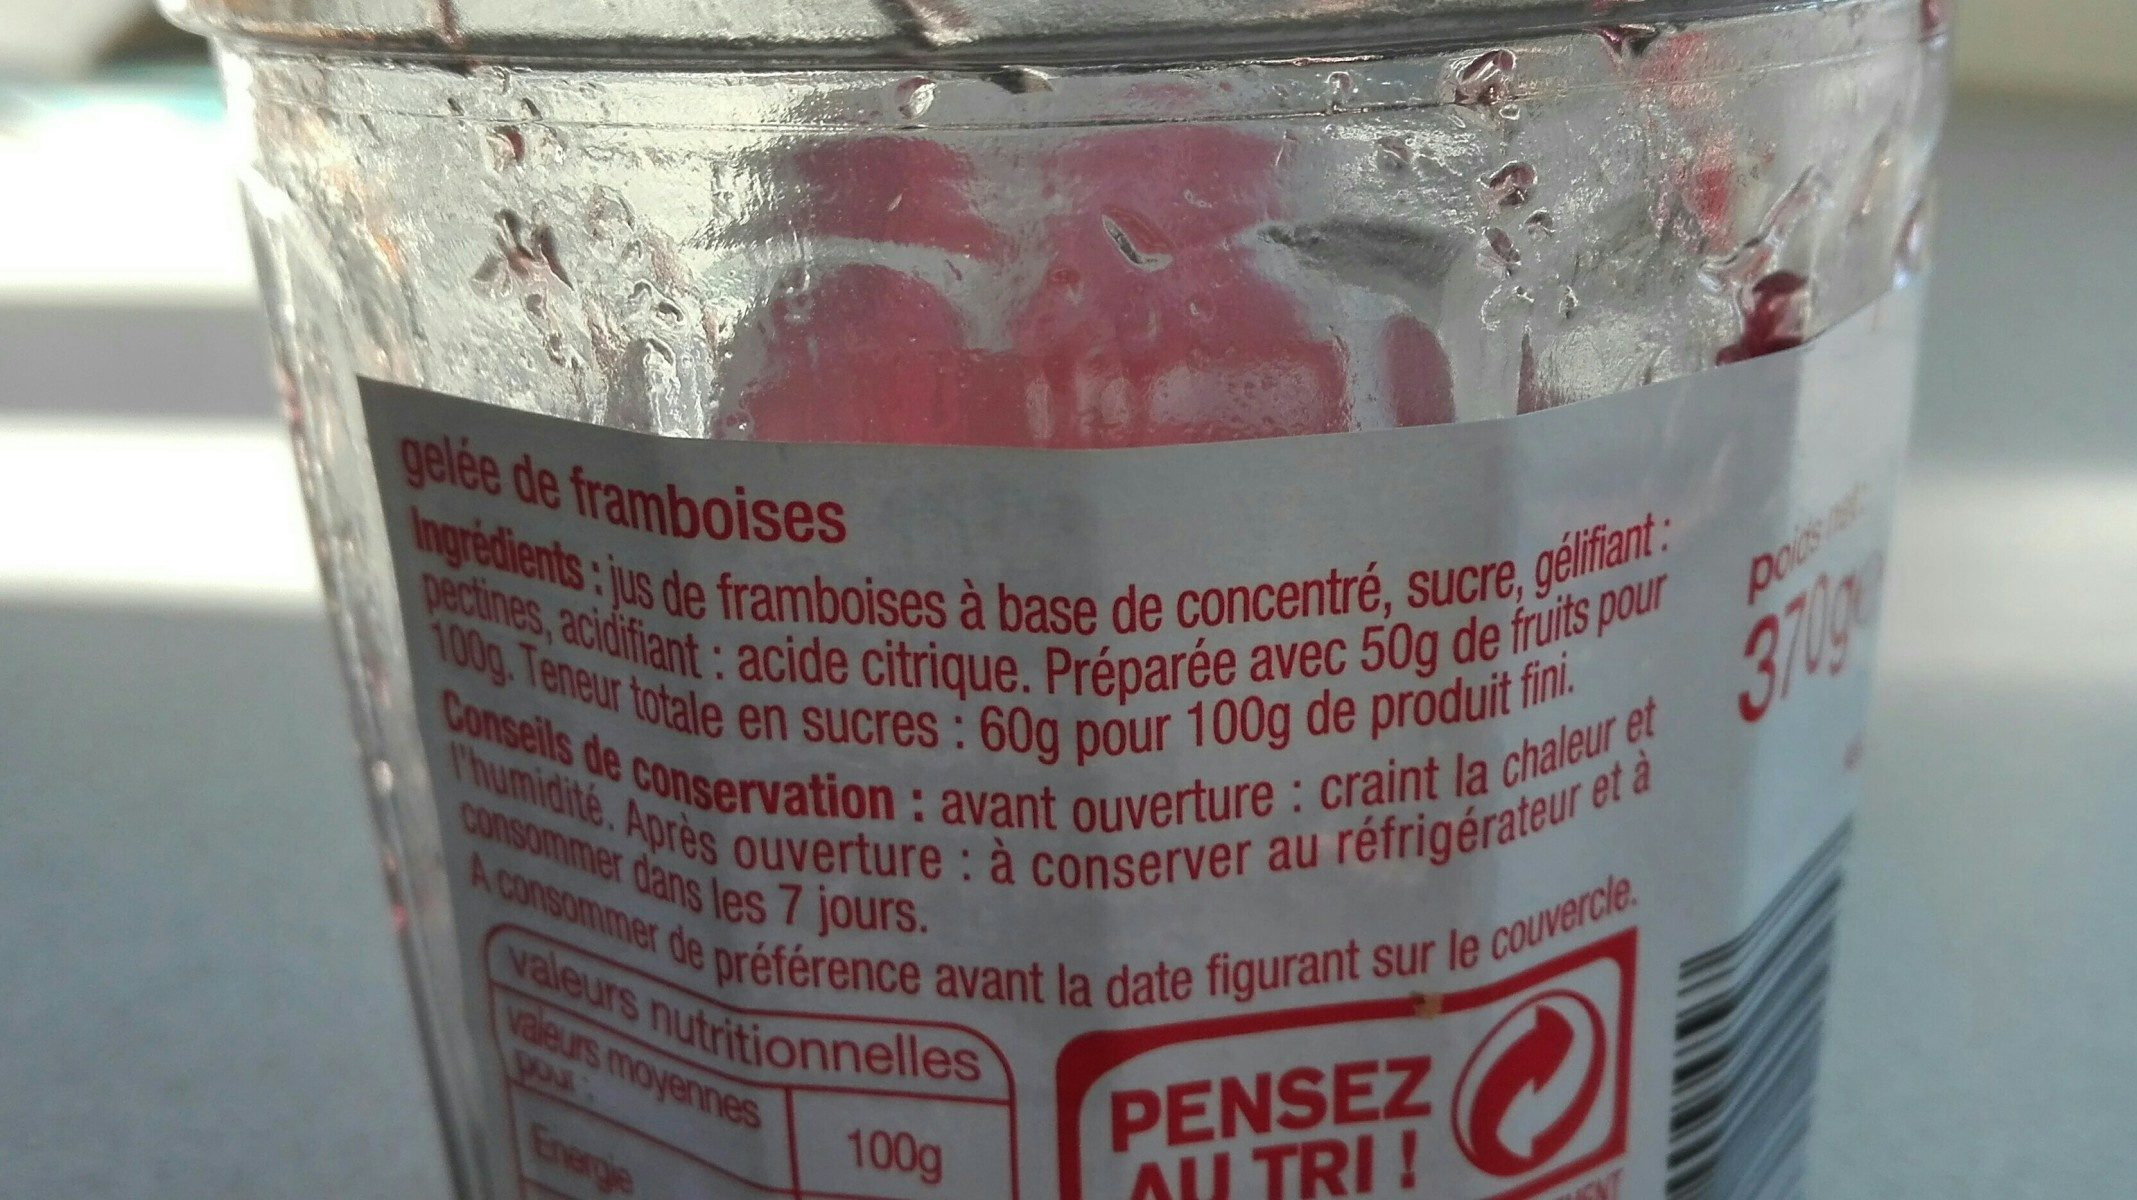 Gelée de framboises - Ingrediënten